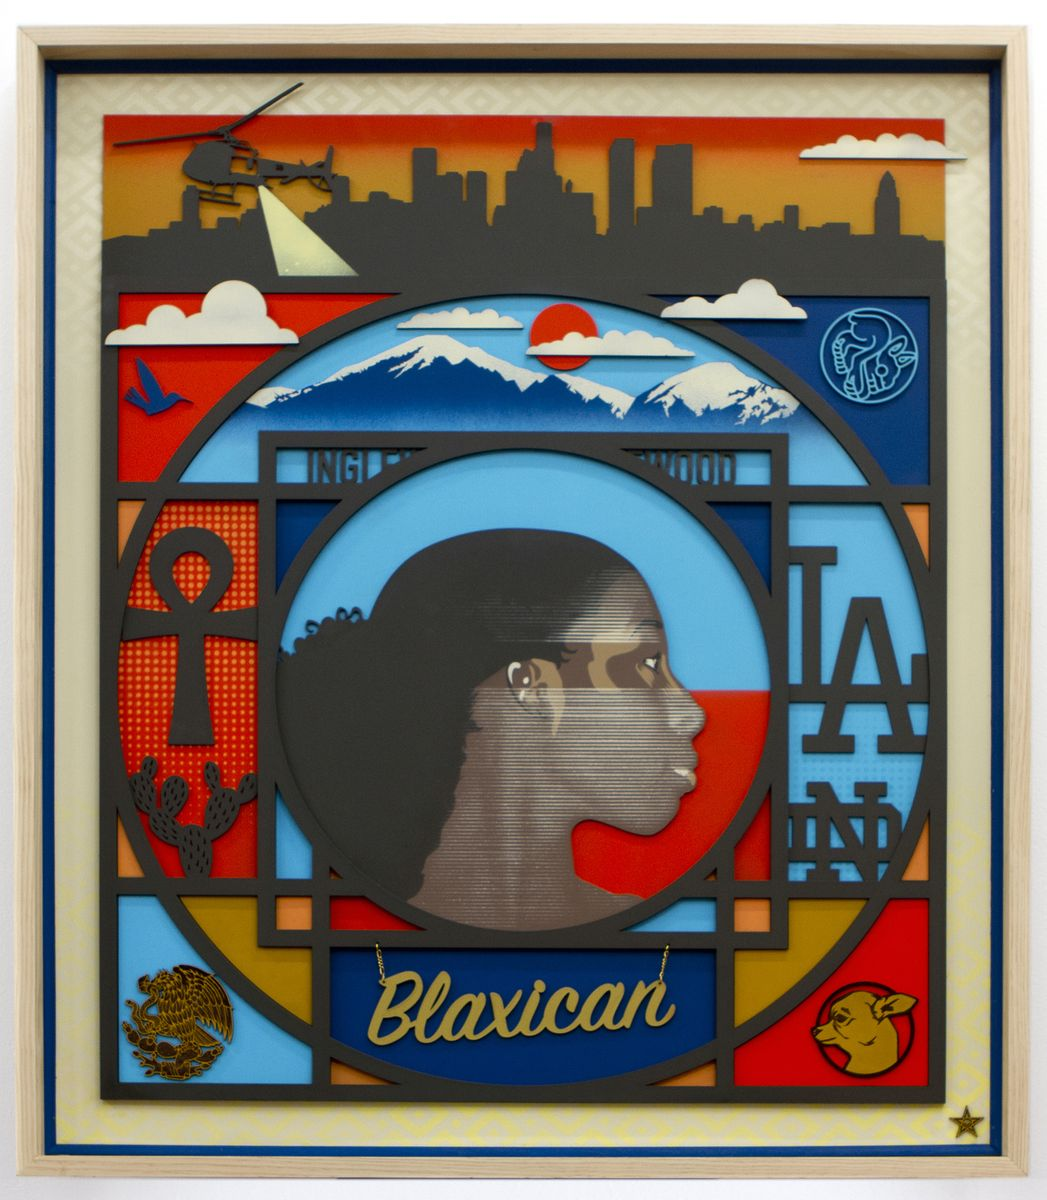 Oscar Magallanes - Blaxican painting